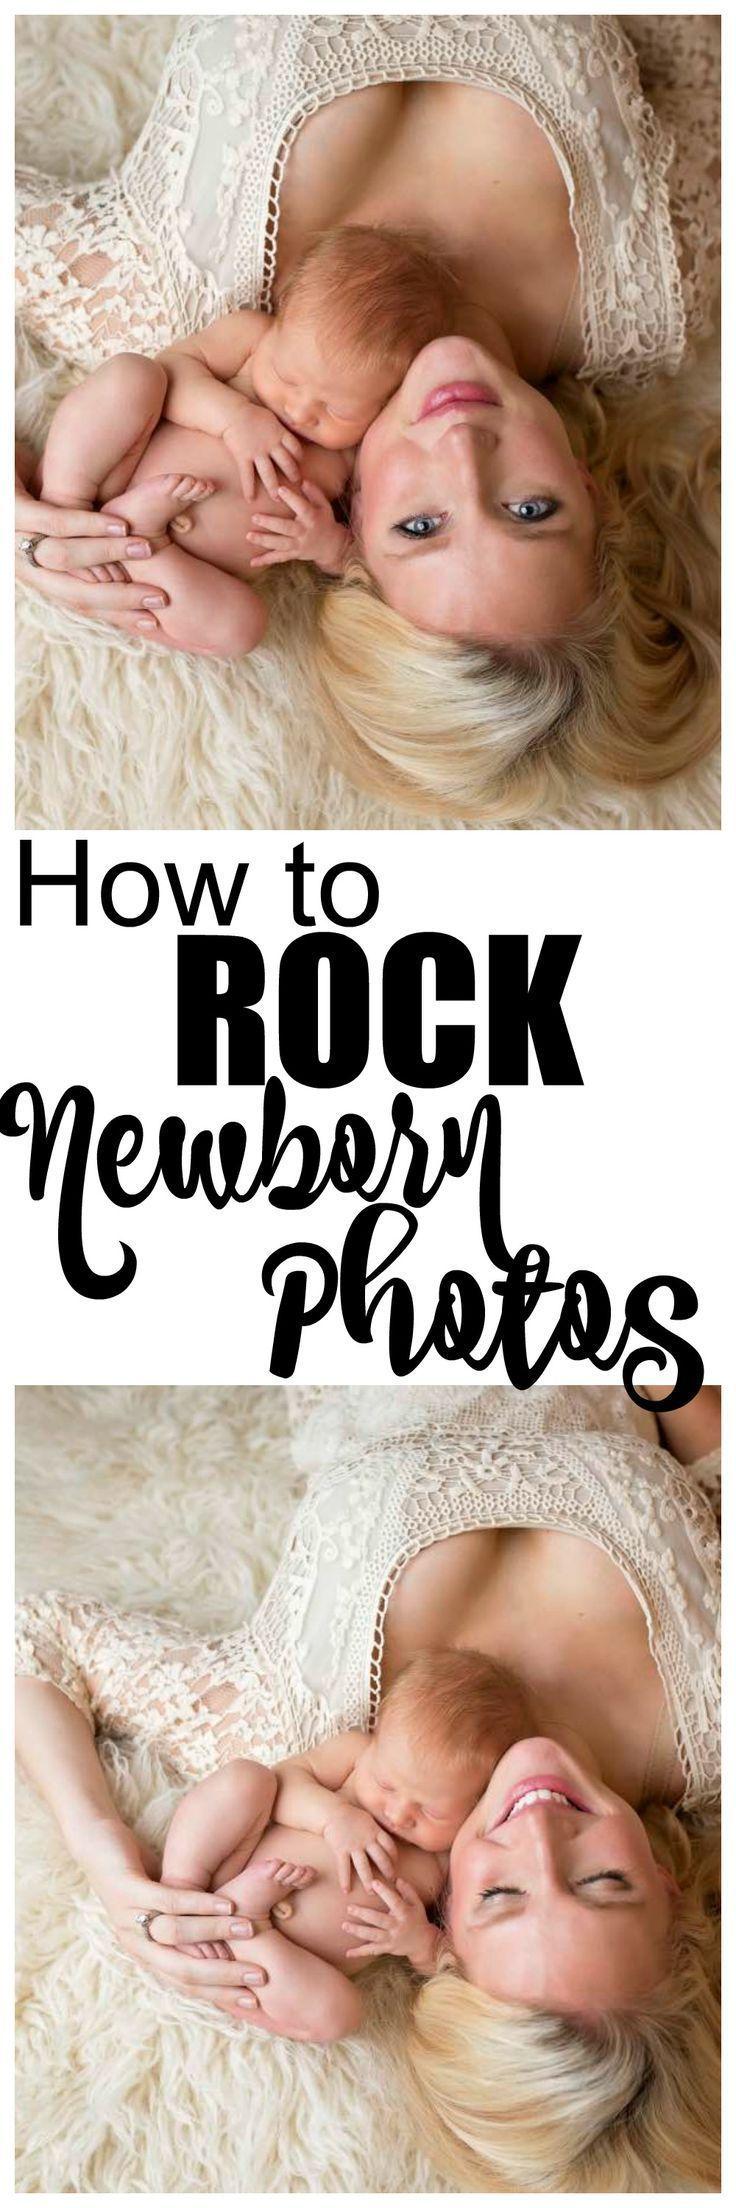 Henley Rae's Newborn Photography Photo Ideas - #Henley #Ideas #Newborn #Photo #p...